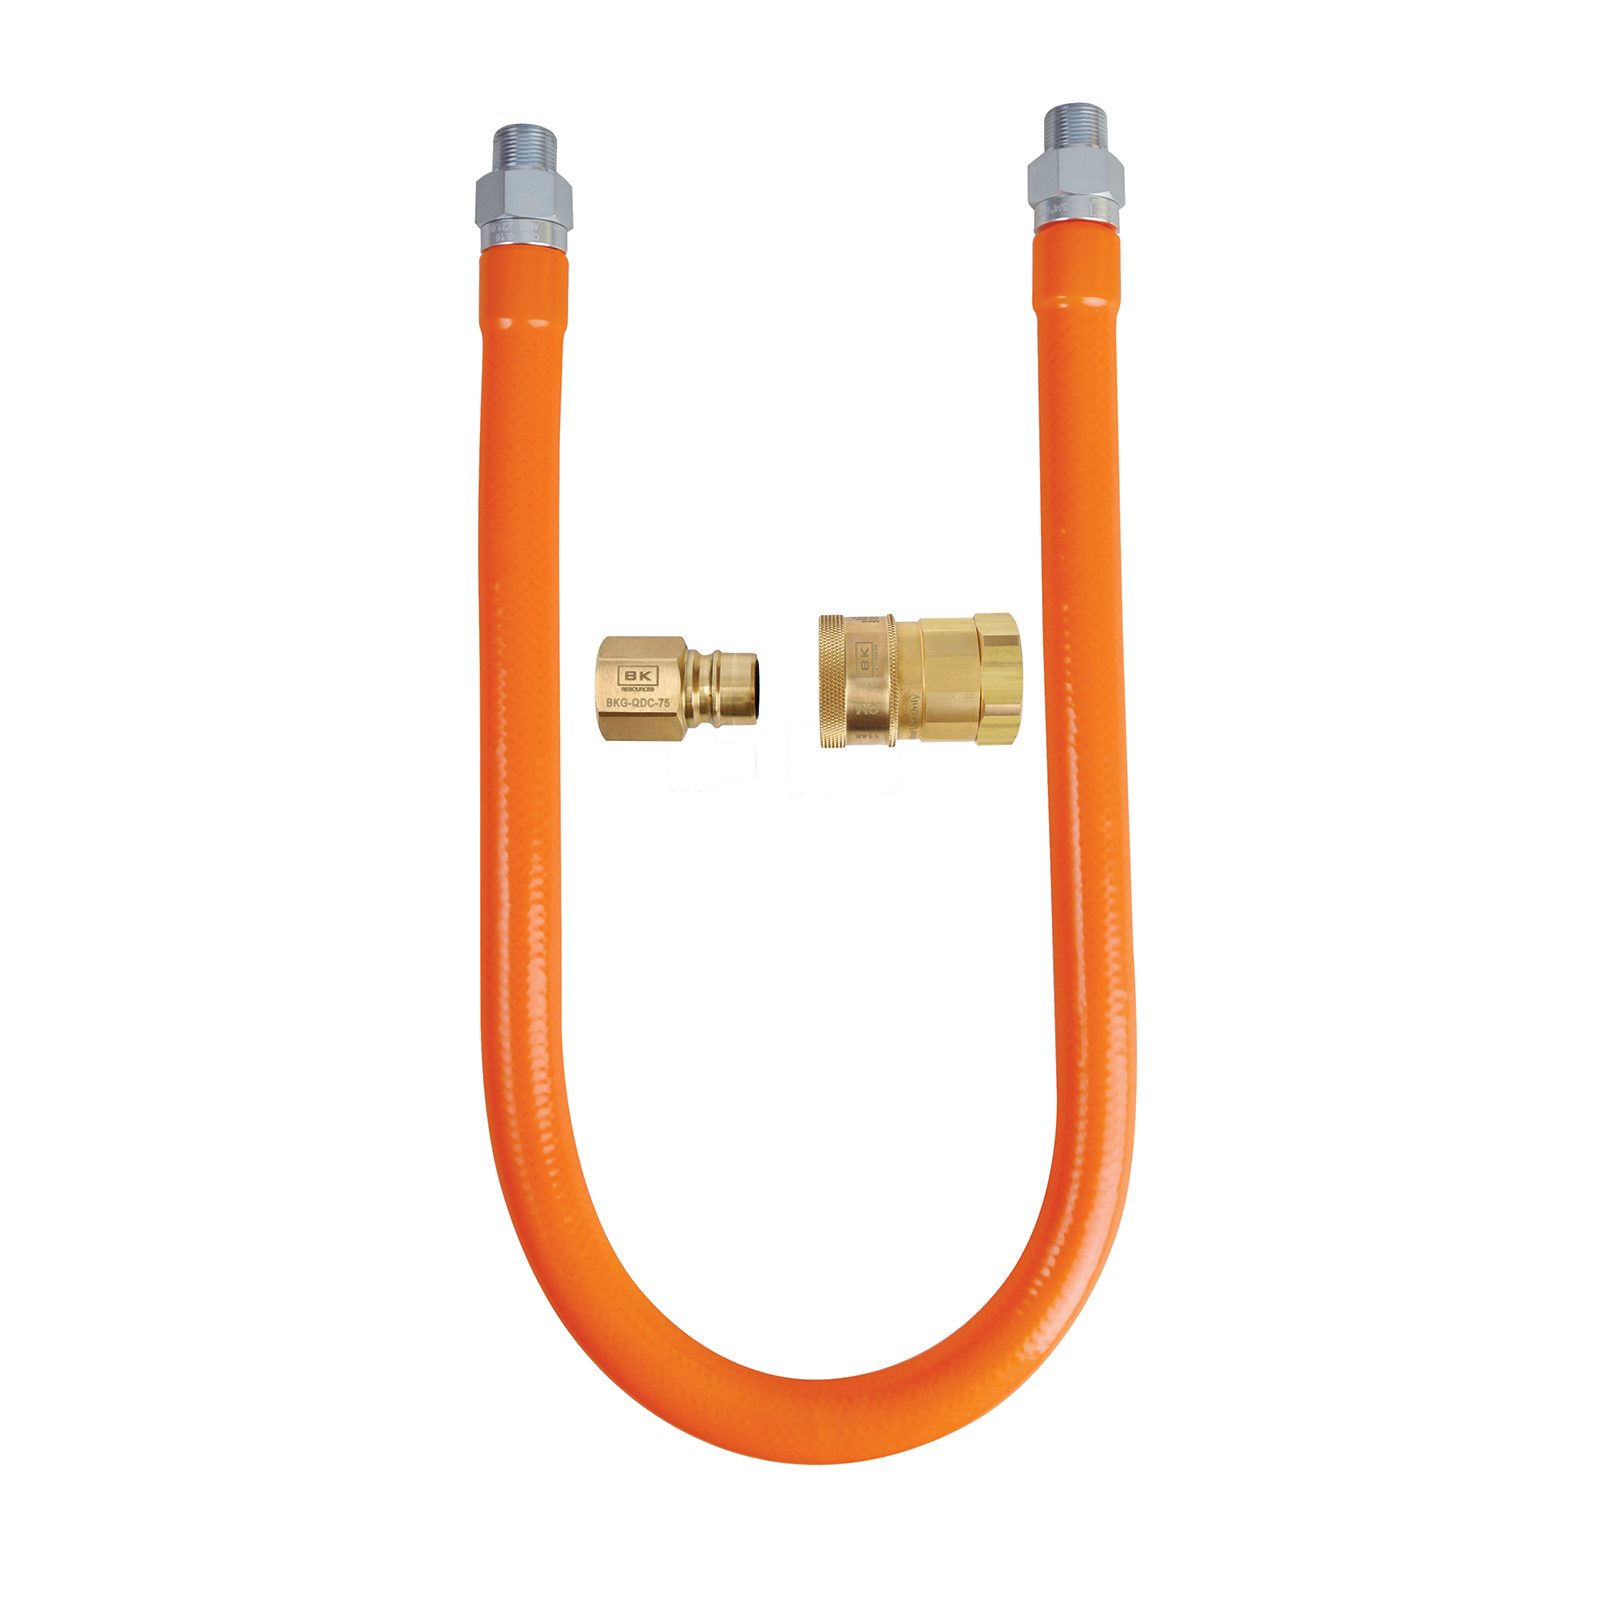 BK Resources BKG-GHC-5036-QD-PT gas connector hose kit